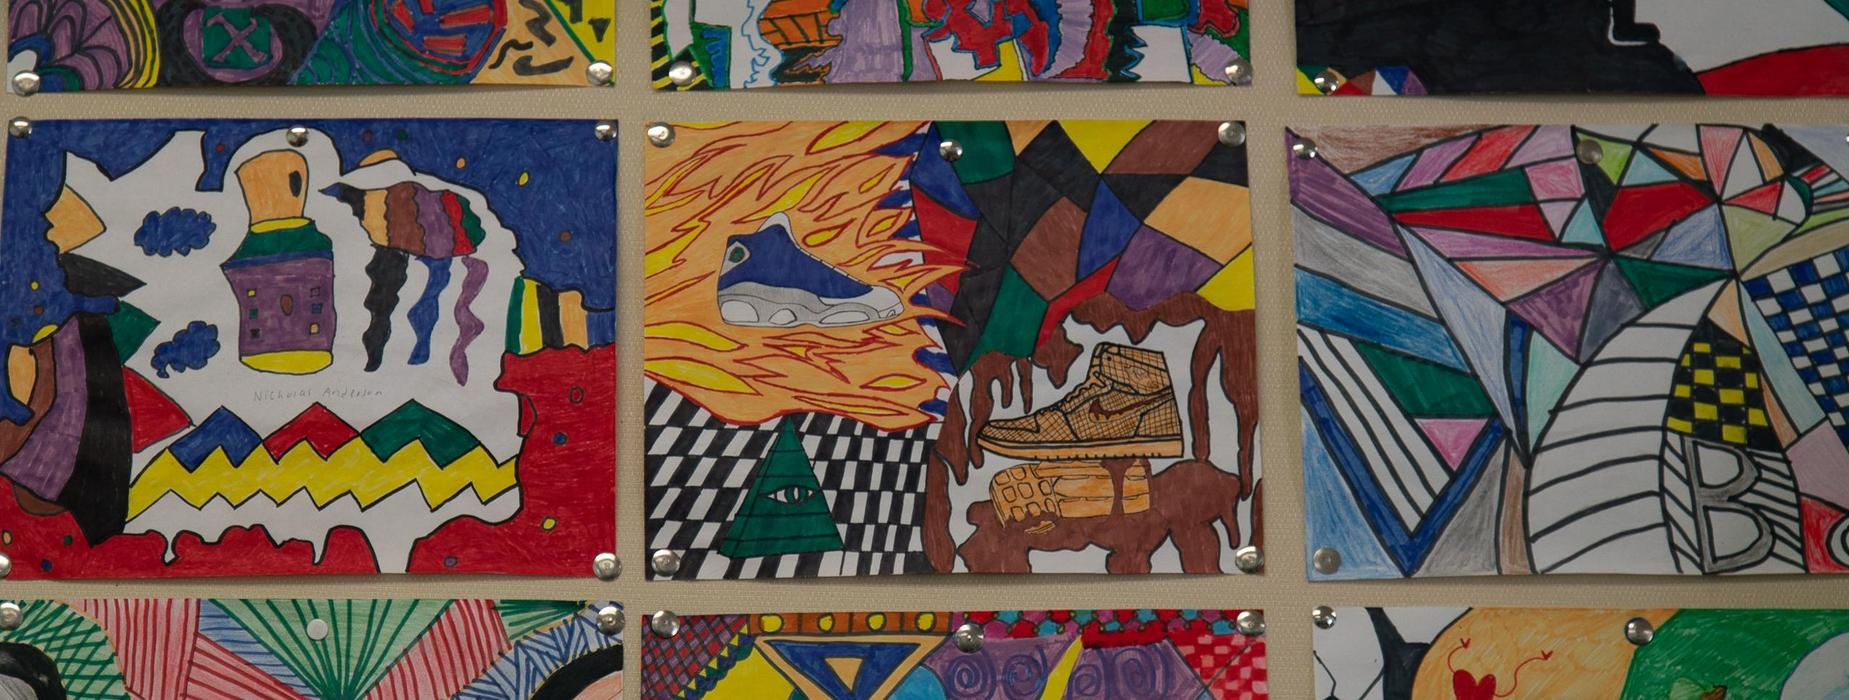 CHS Student art work